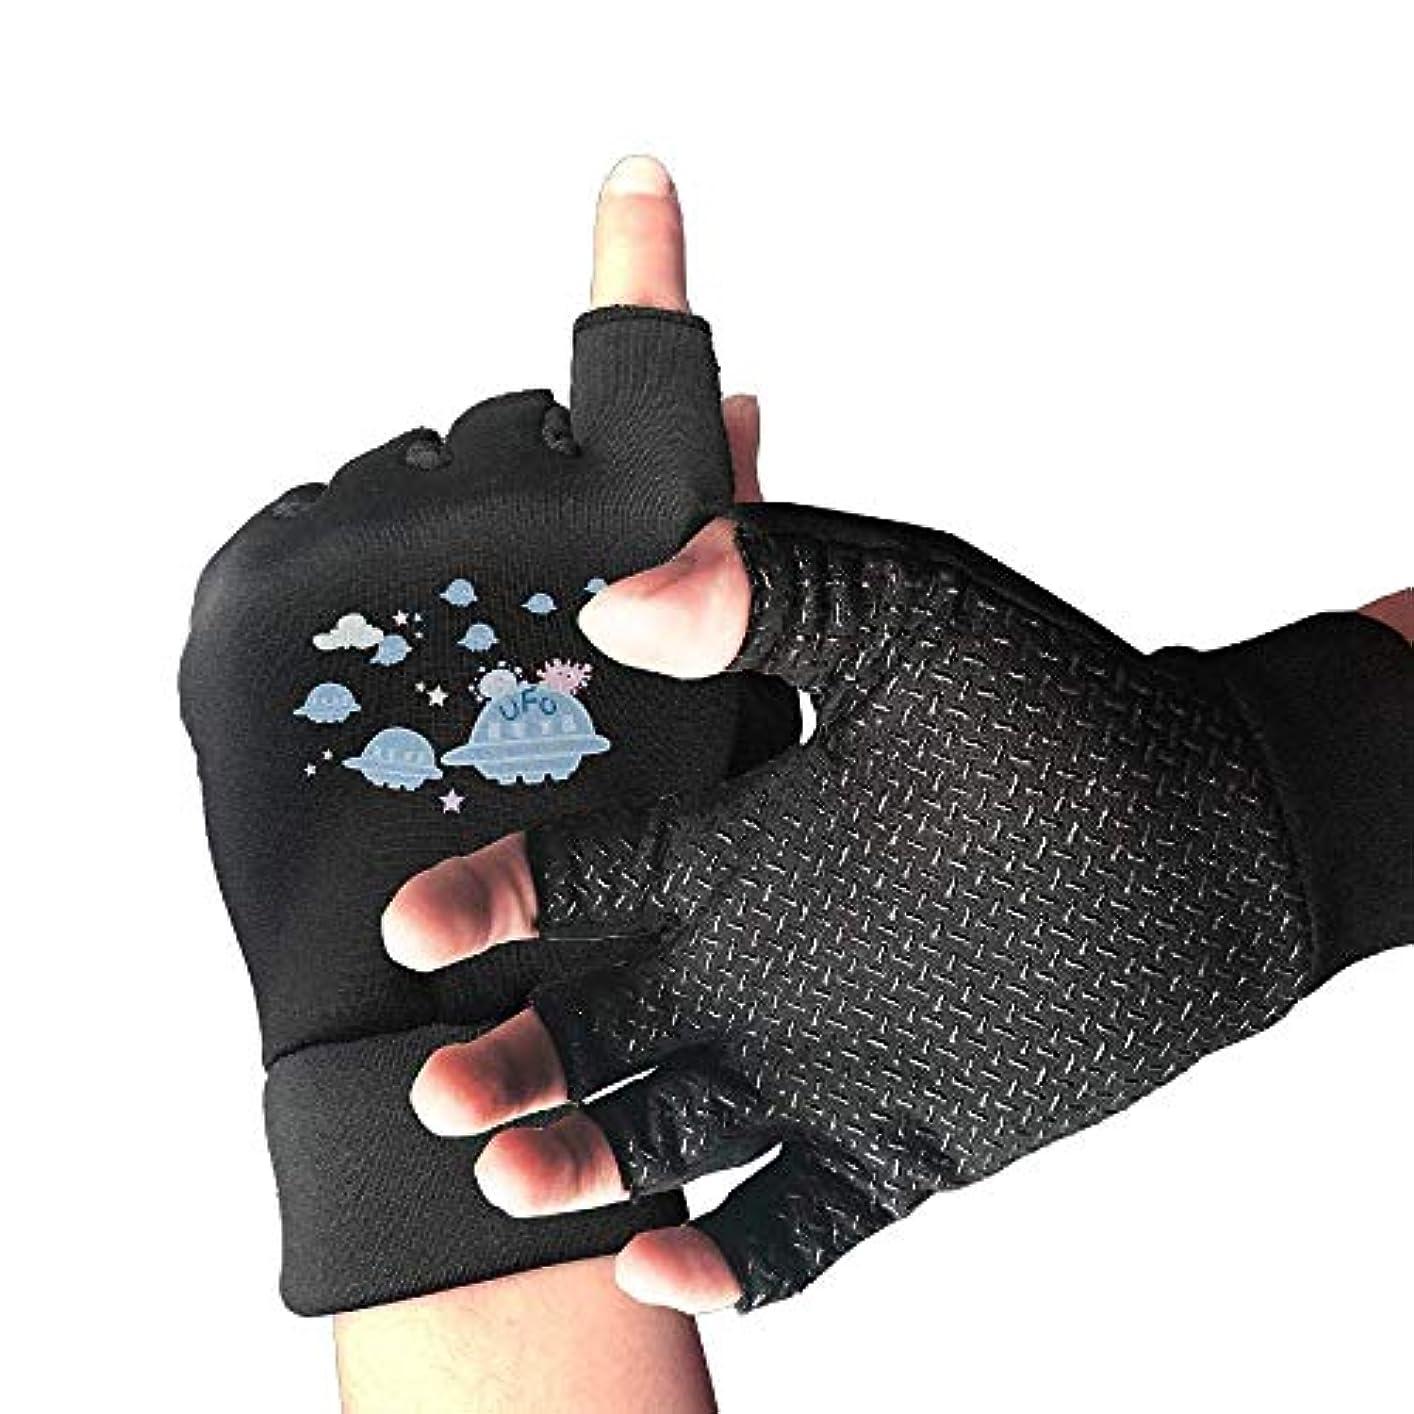 陪審競争輸送Cycling Gloves Airship UFO Men's/Women's Mountain Bike Gloves Half Finger Anti-Slip Motorcycle Gloves